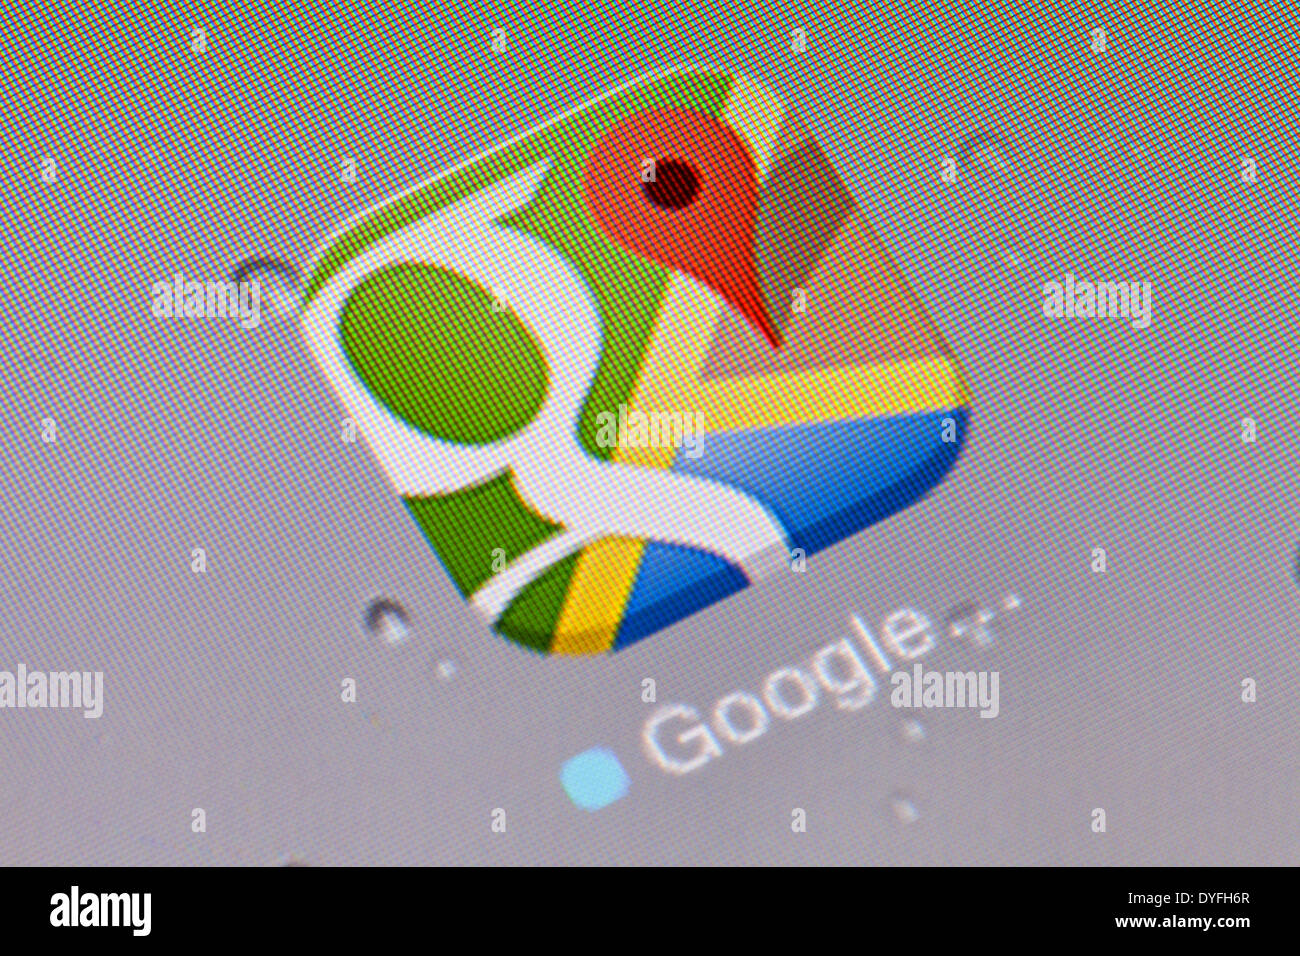 Google maps app logo icon on iPad apps logos icons Stock ... on apple maps app, google maps for android, google map web app, google earth ipad app,